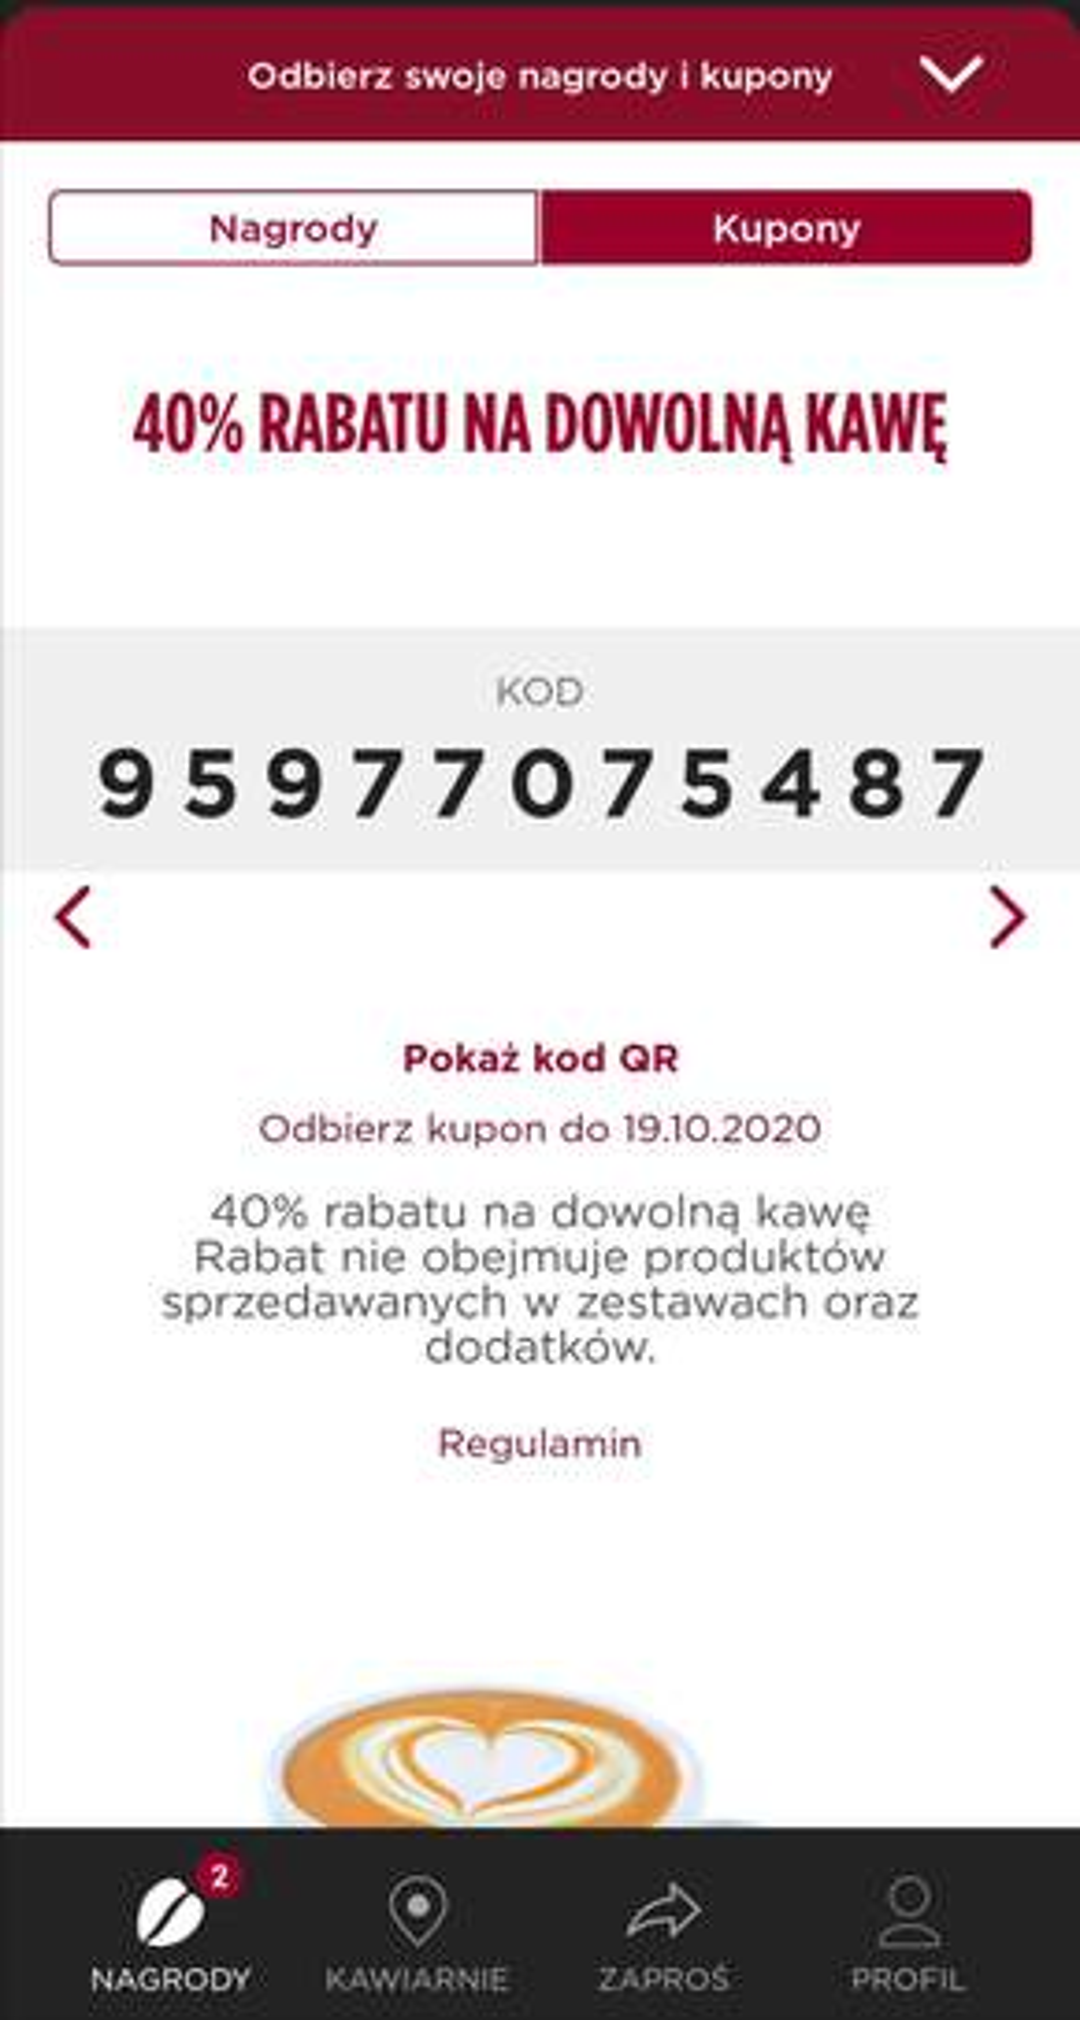 5240839-BQSPD.jpg